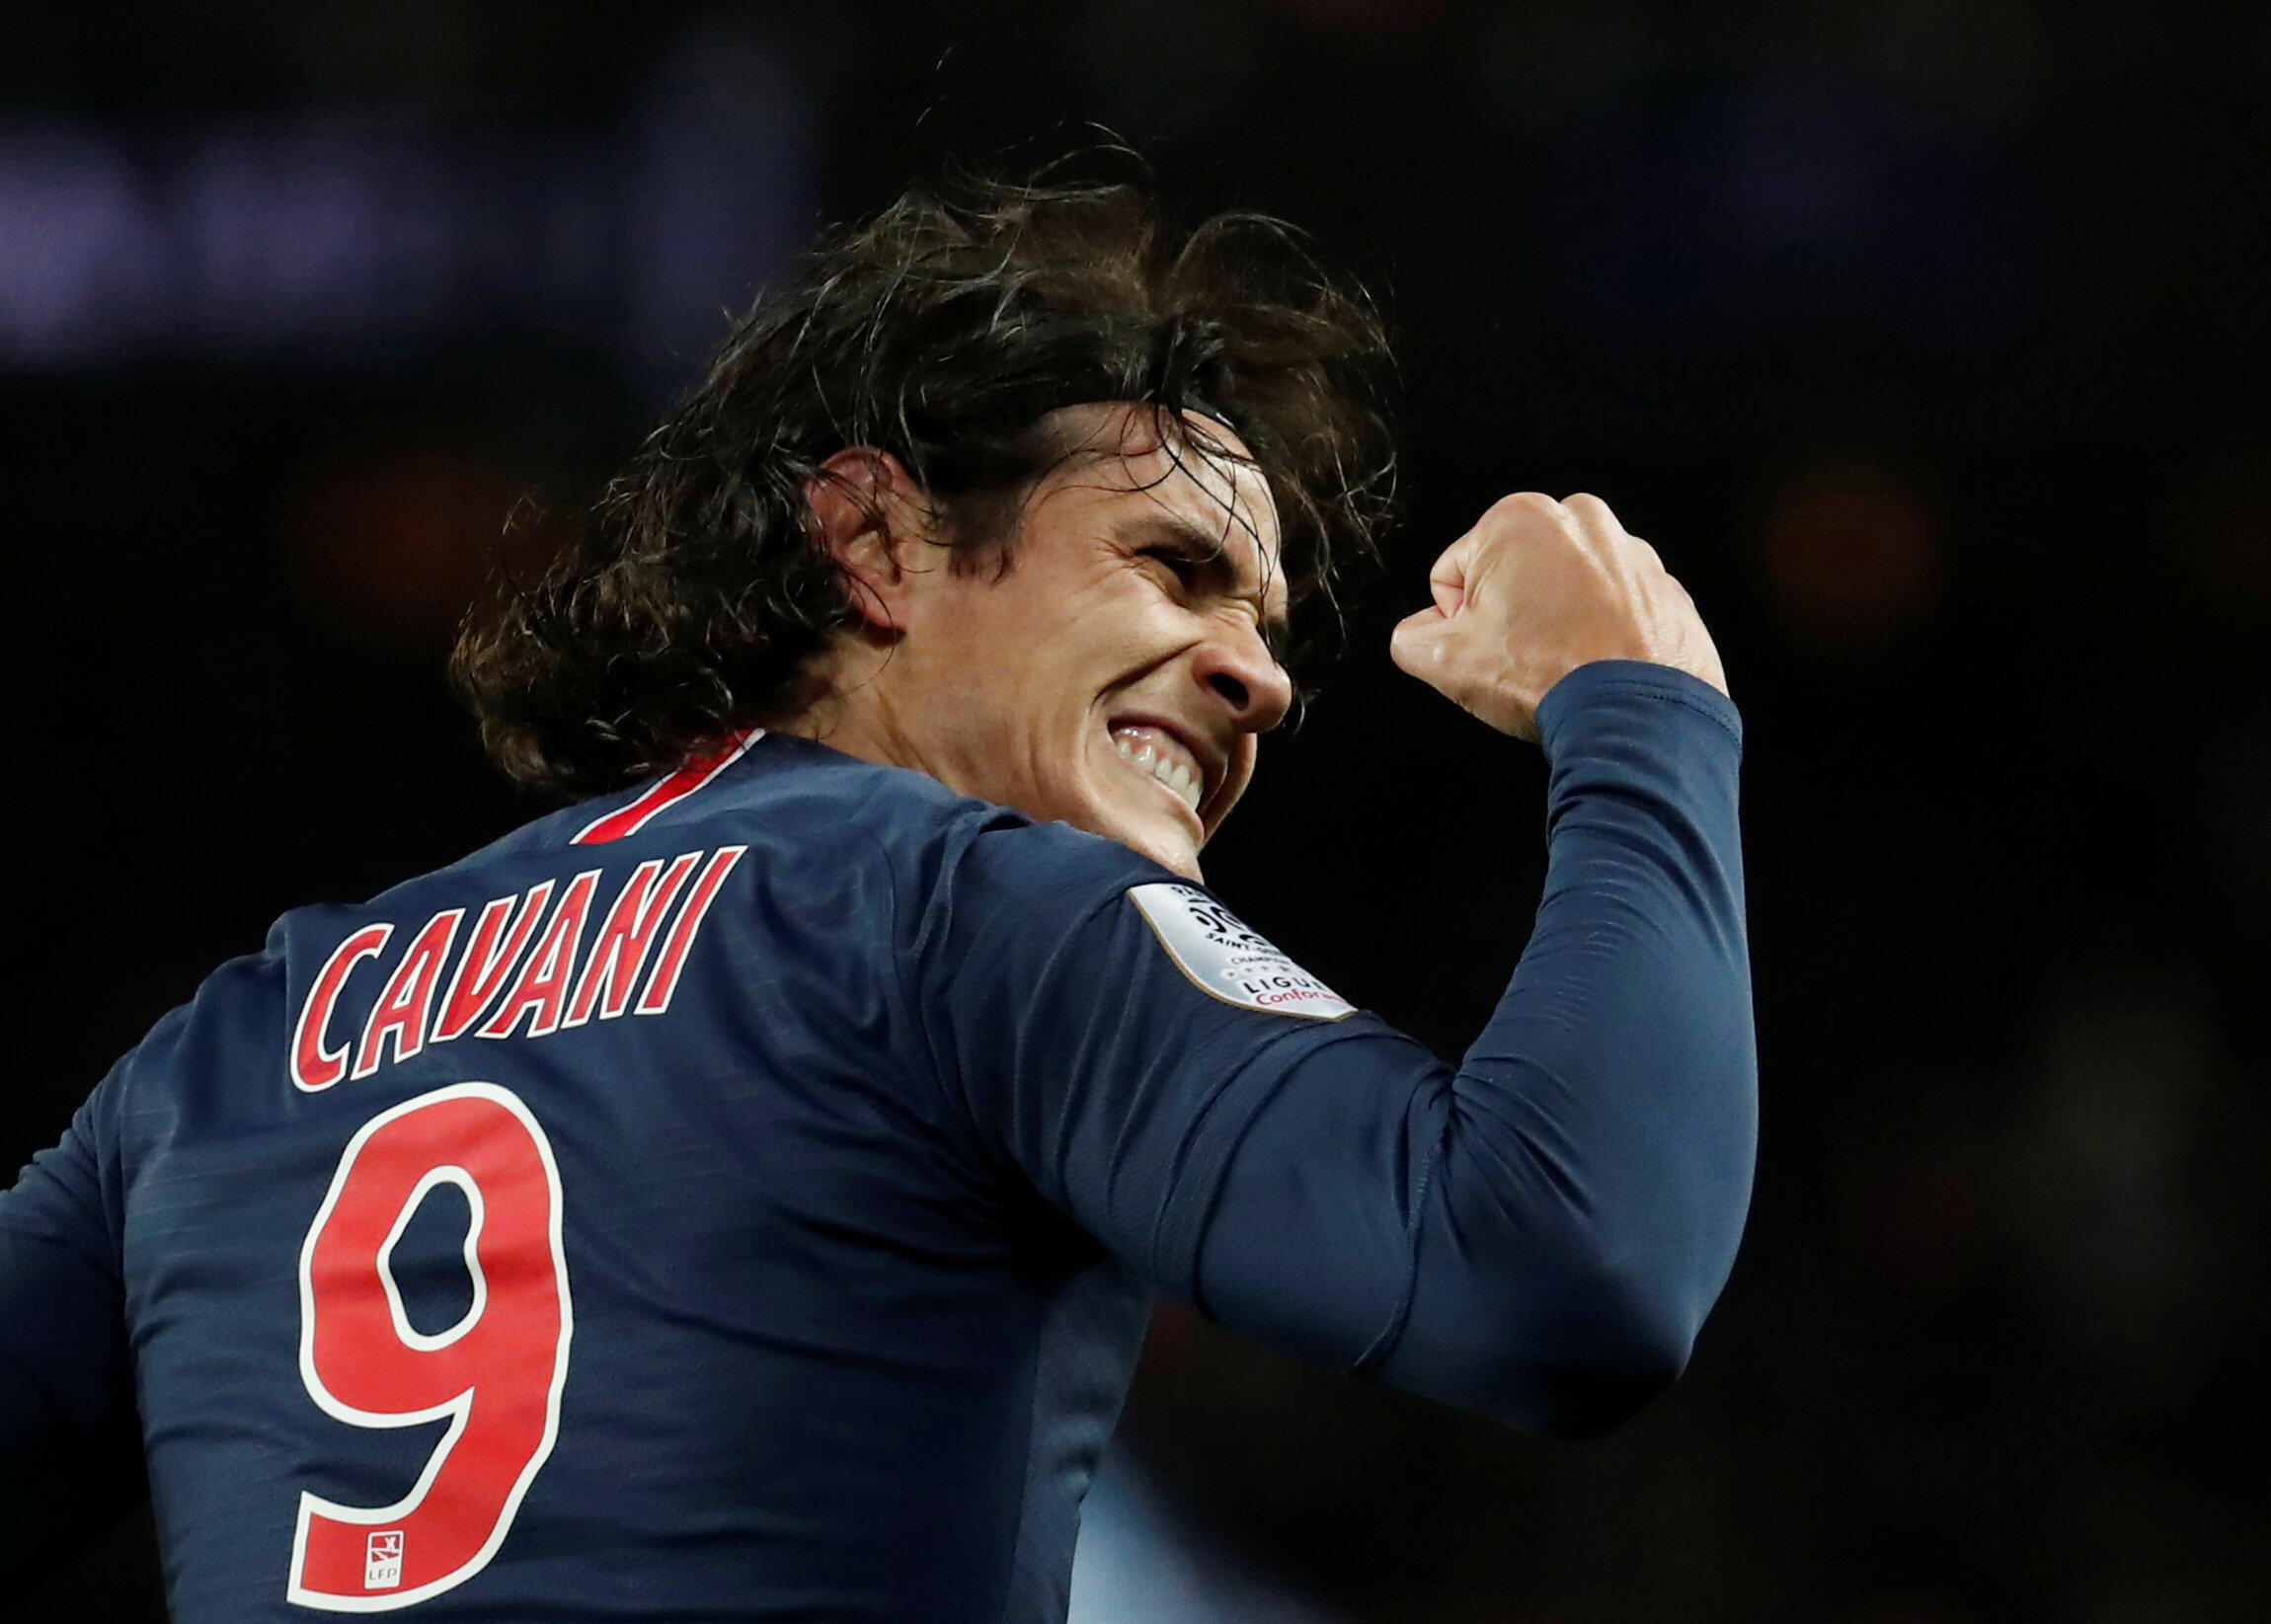 Edinson Cavani was substituted after scoring PSG's winner against Bordeaux.